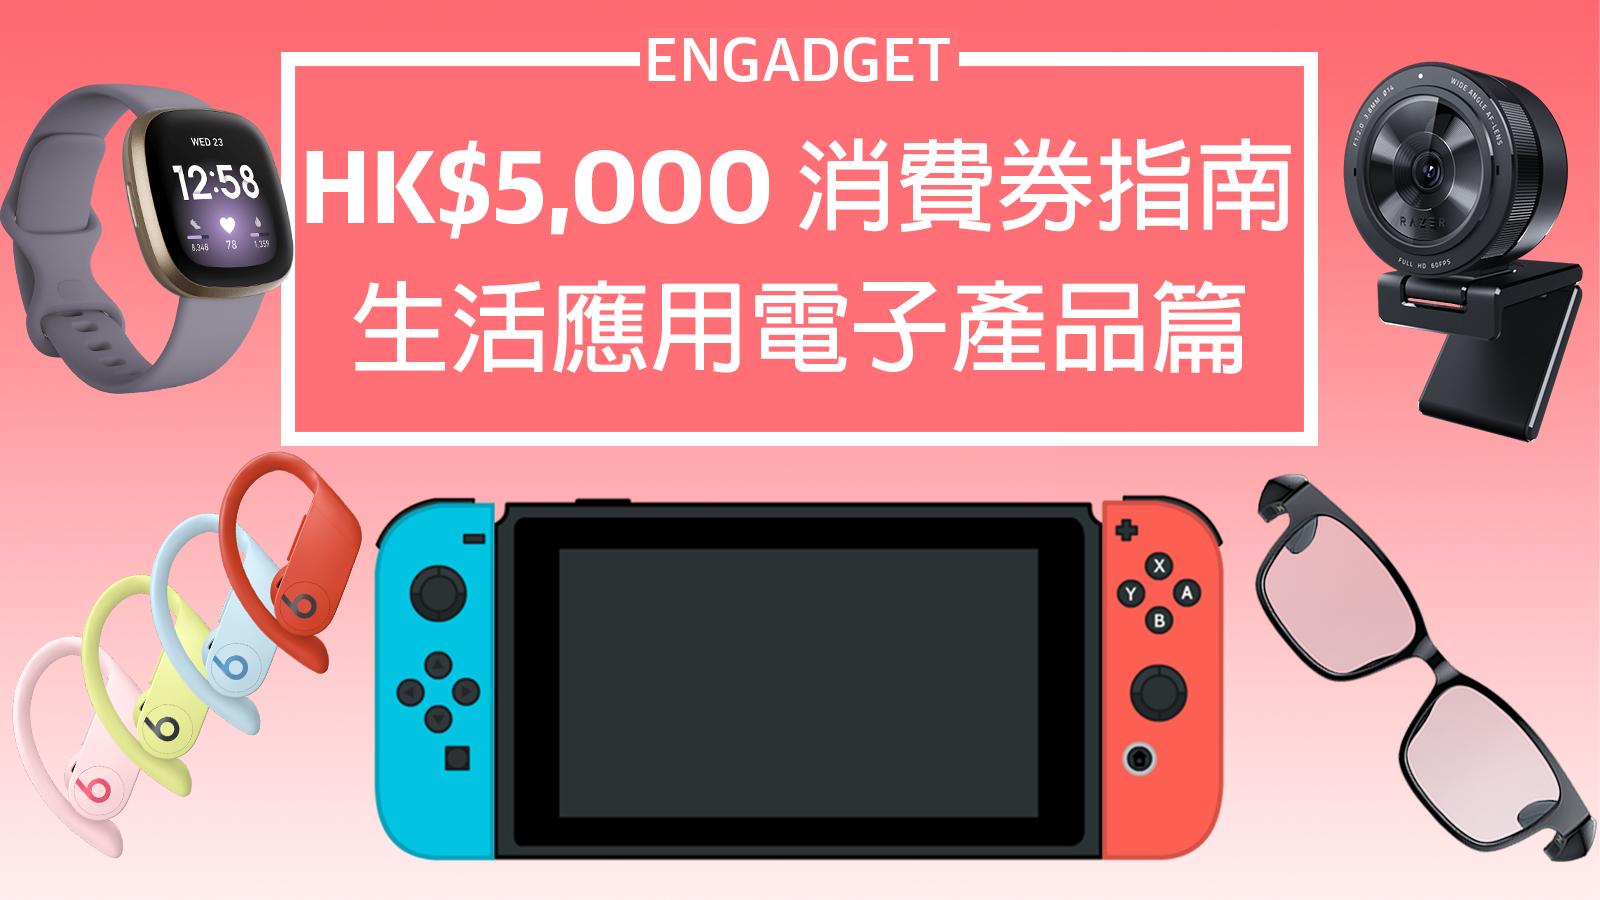 HK$5,000 消費券購物指南:生活電子產品篇